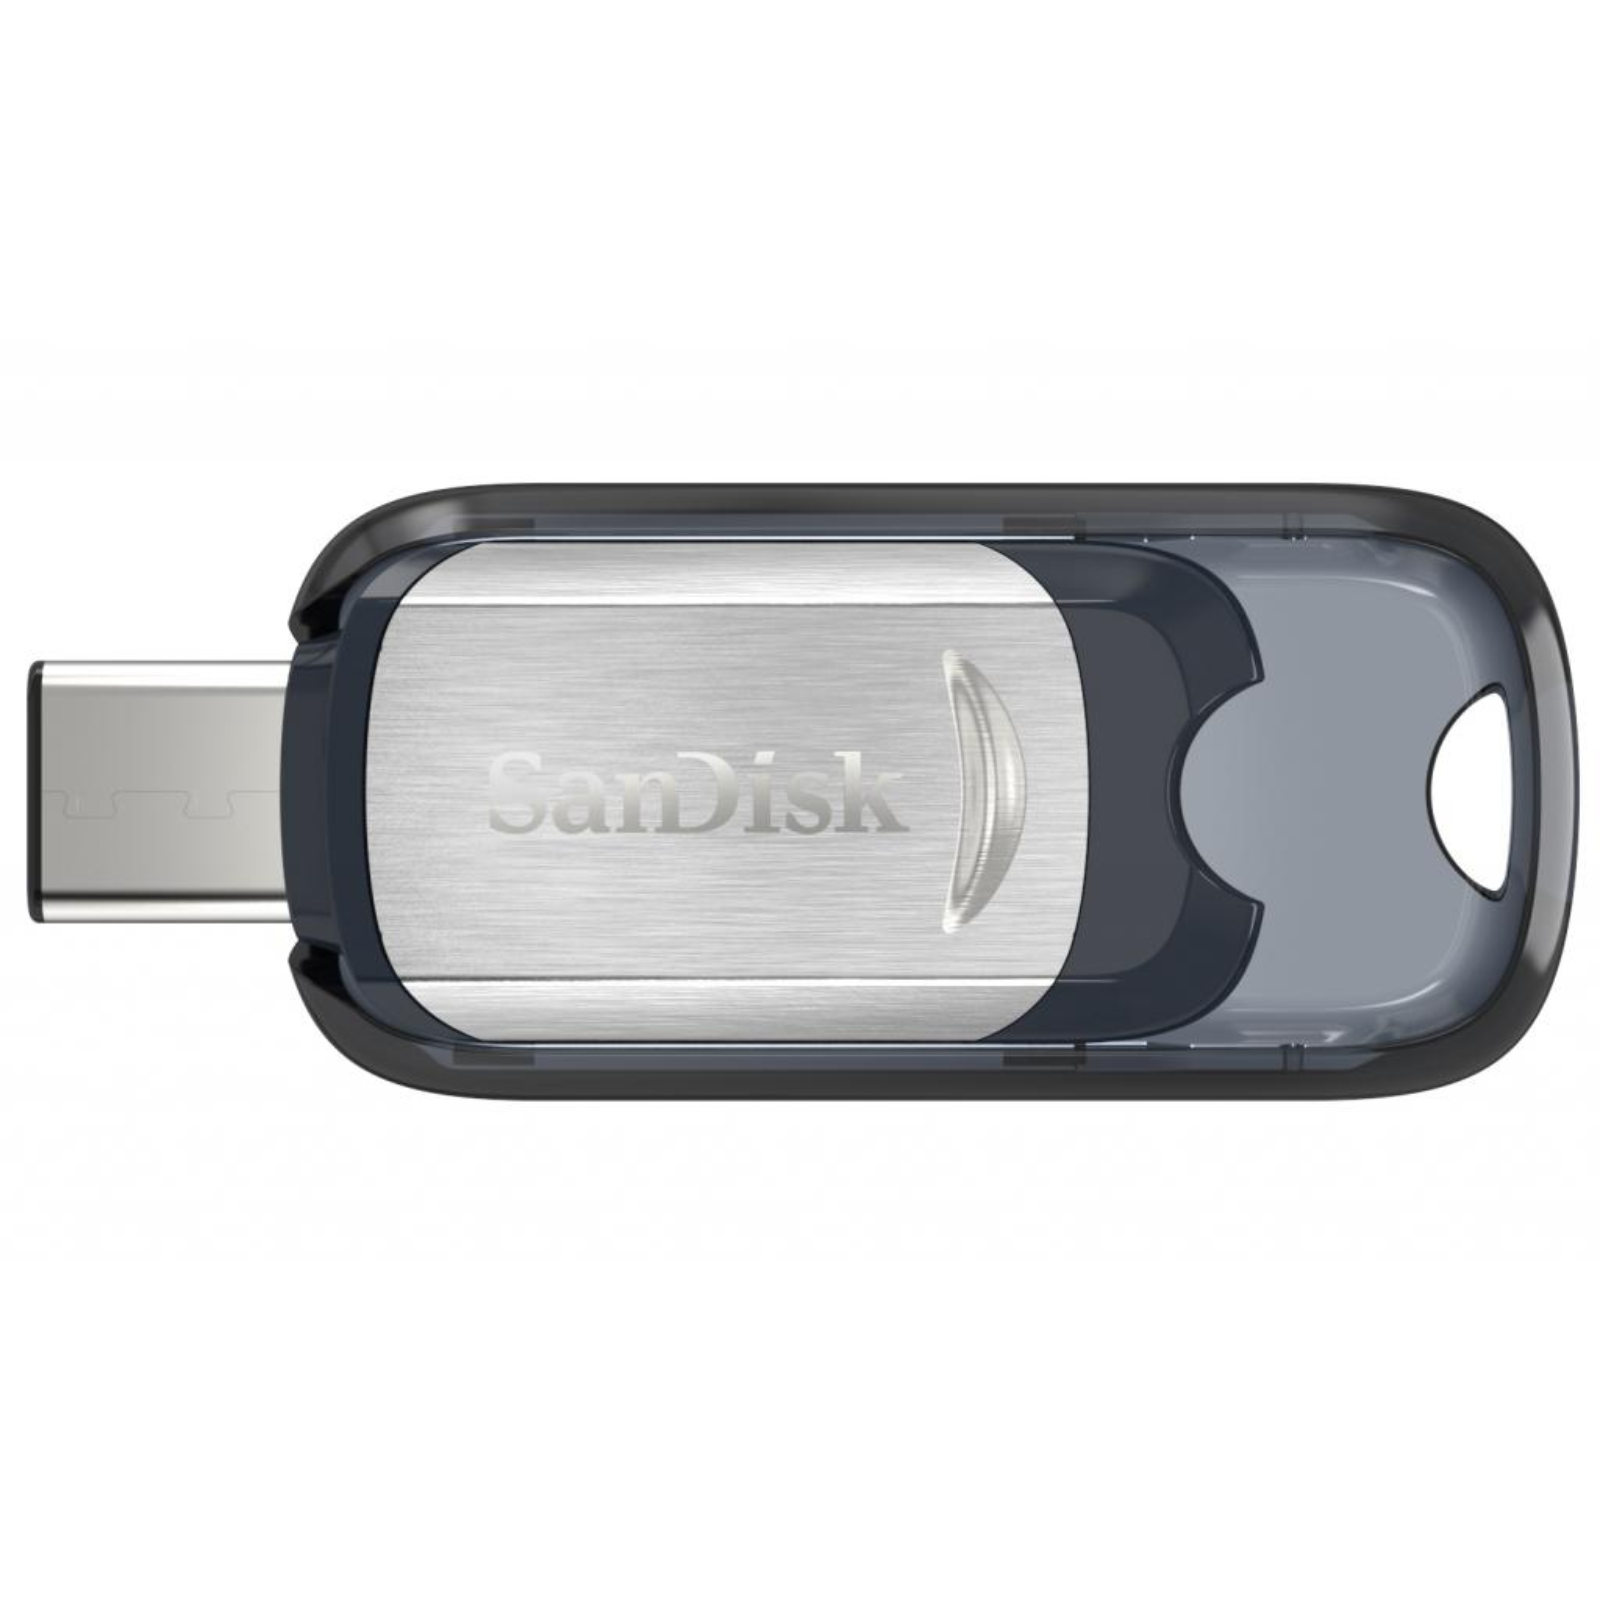 USB флеш накопитель SanDisk 64Gb Ultra USB 3.0 (SDCZ48-064G-U46) изображение 2